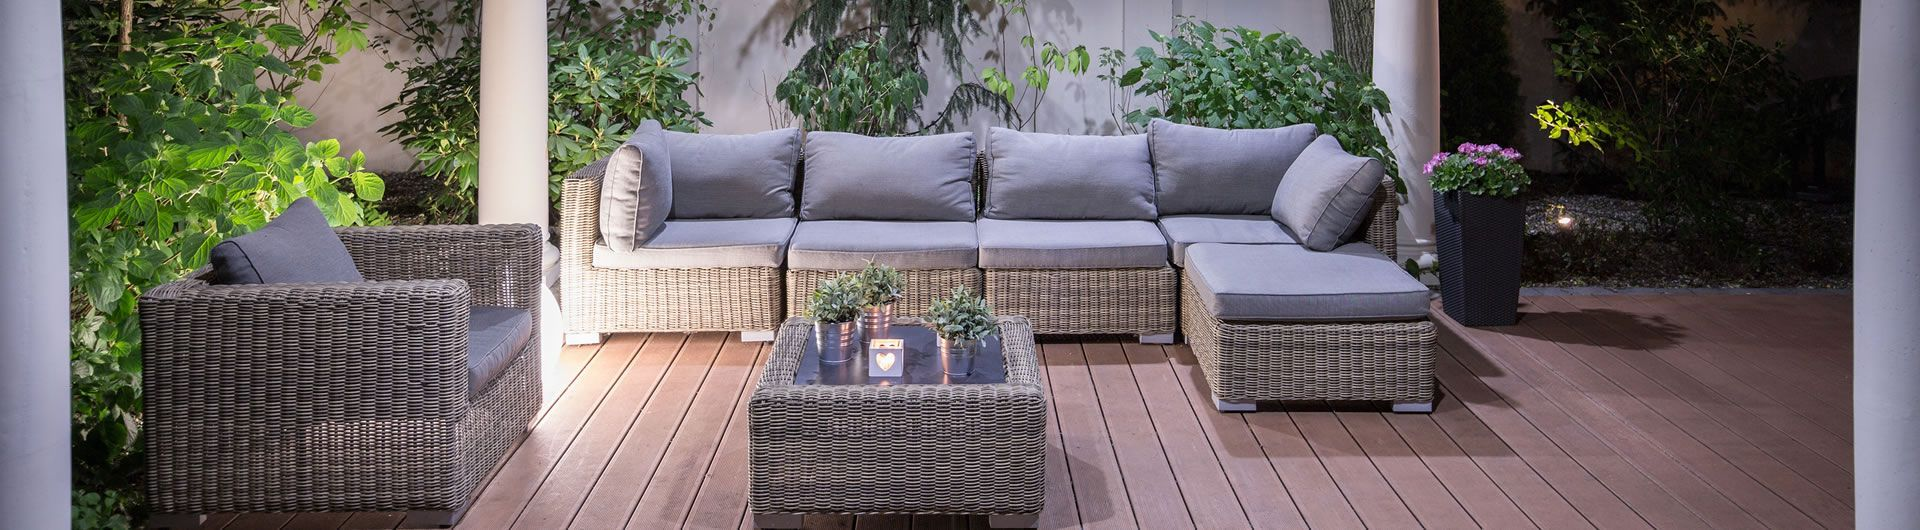 Evening blue grey patio setting